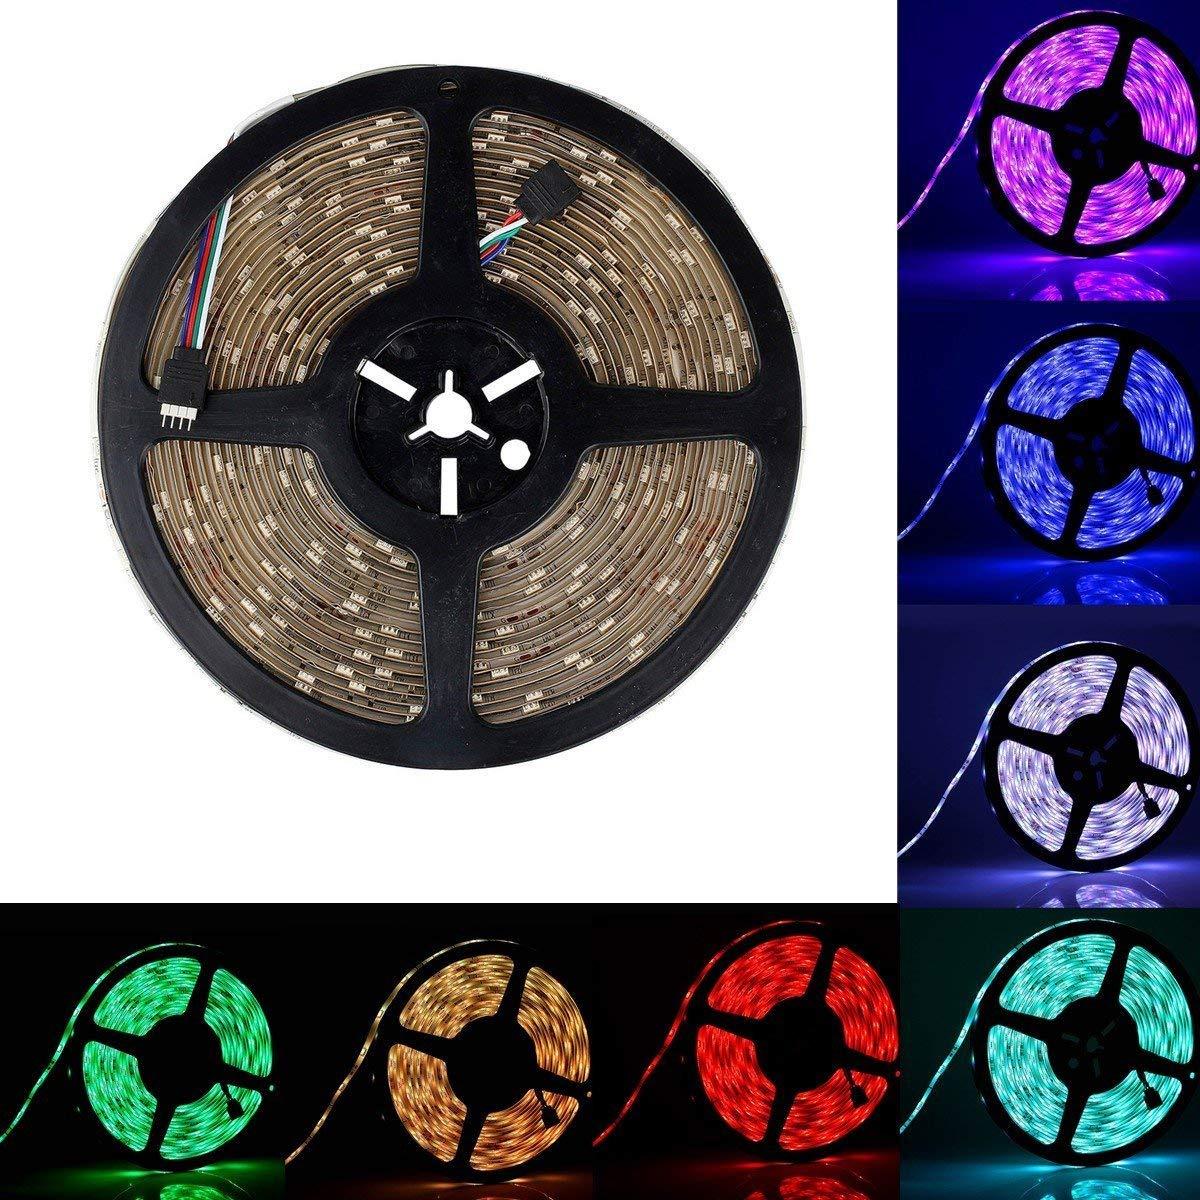 BZONE 10m 32.8FT Color Changing Flexible LED Strip Light 5050 SMD 300 LEDs RGB IP65 Waterproof LED Light Strip Rope Light DC 24V Decorative LED Lighting for Indoor Outdoor Decoration